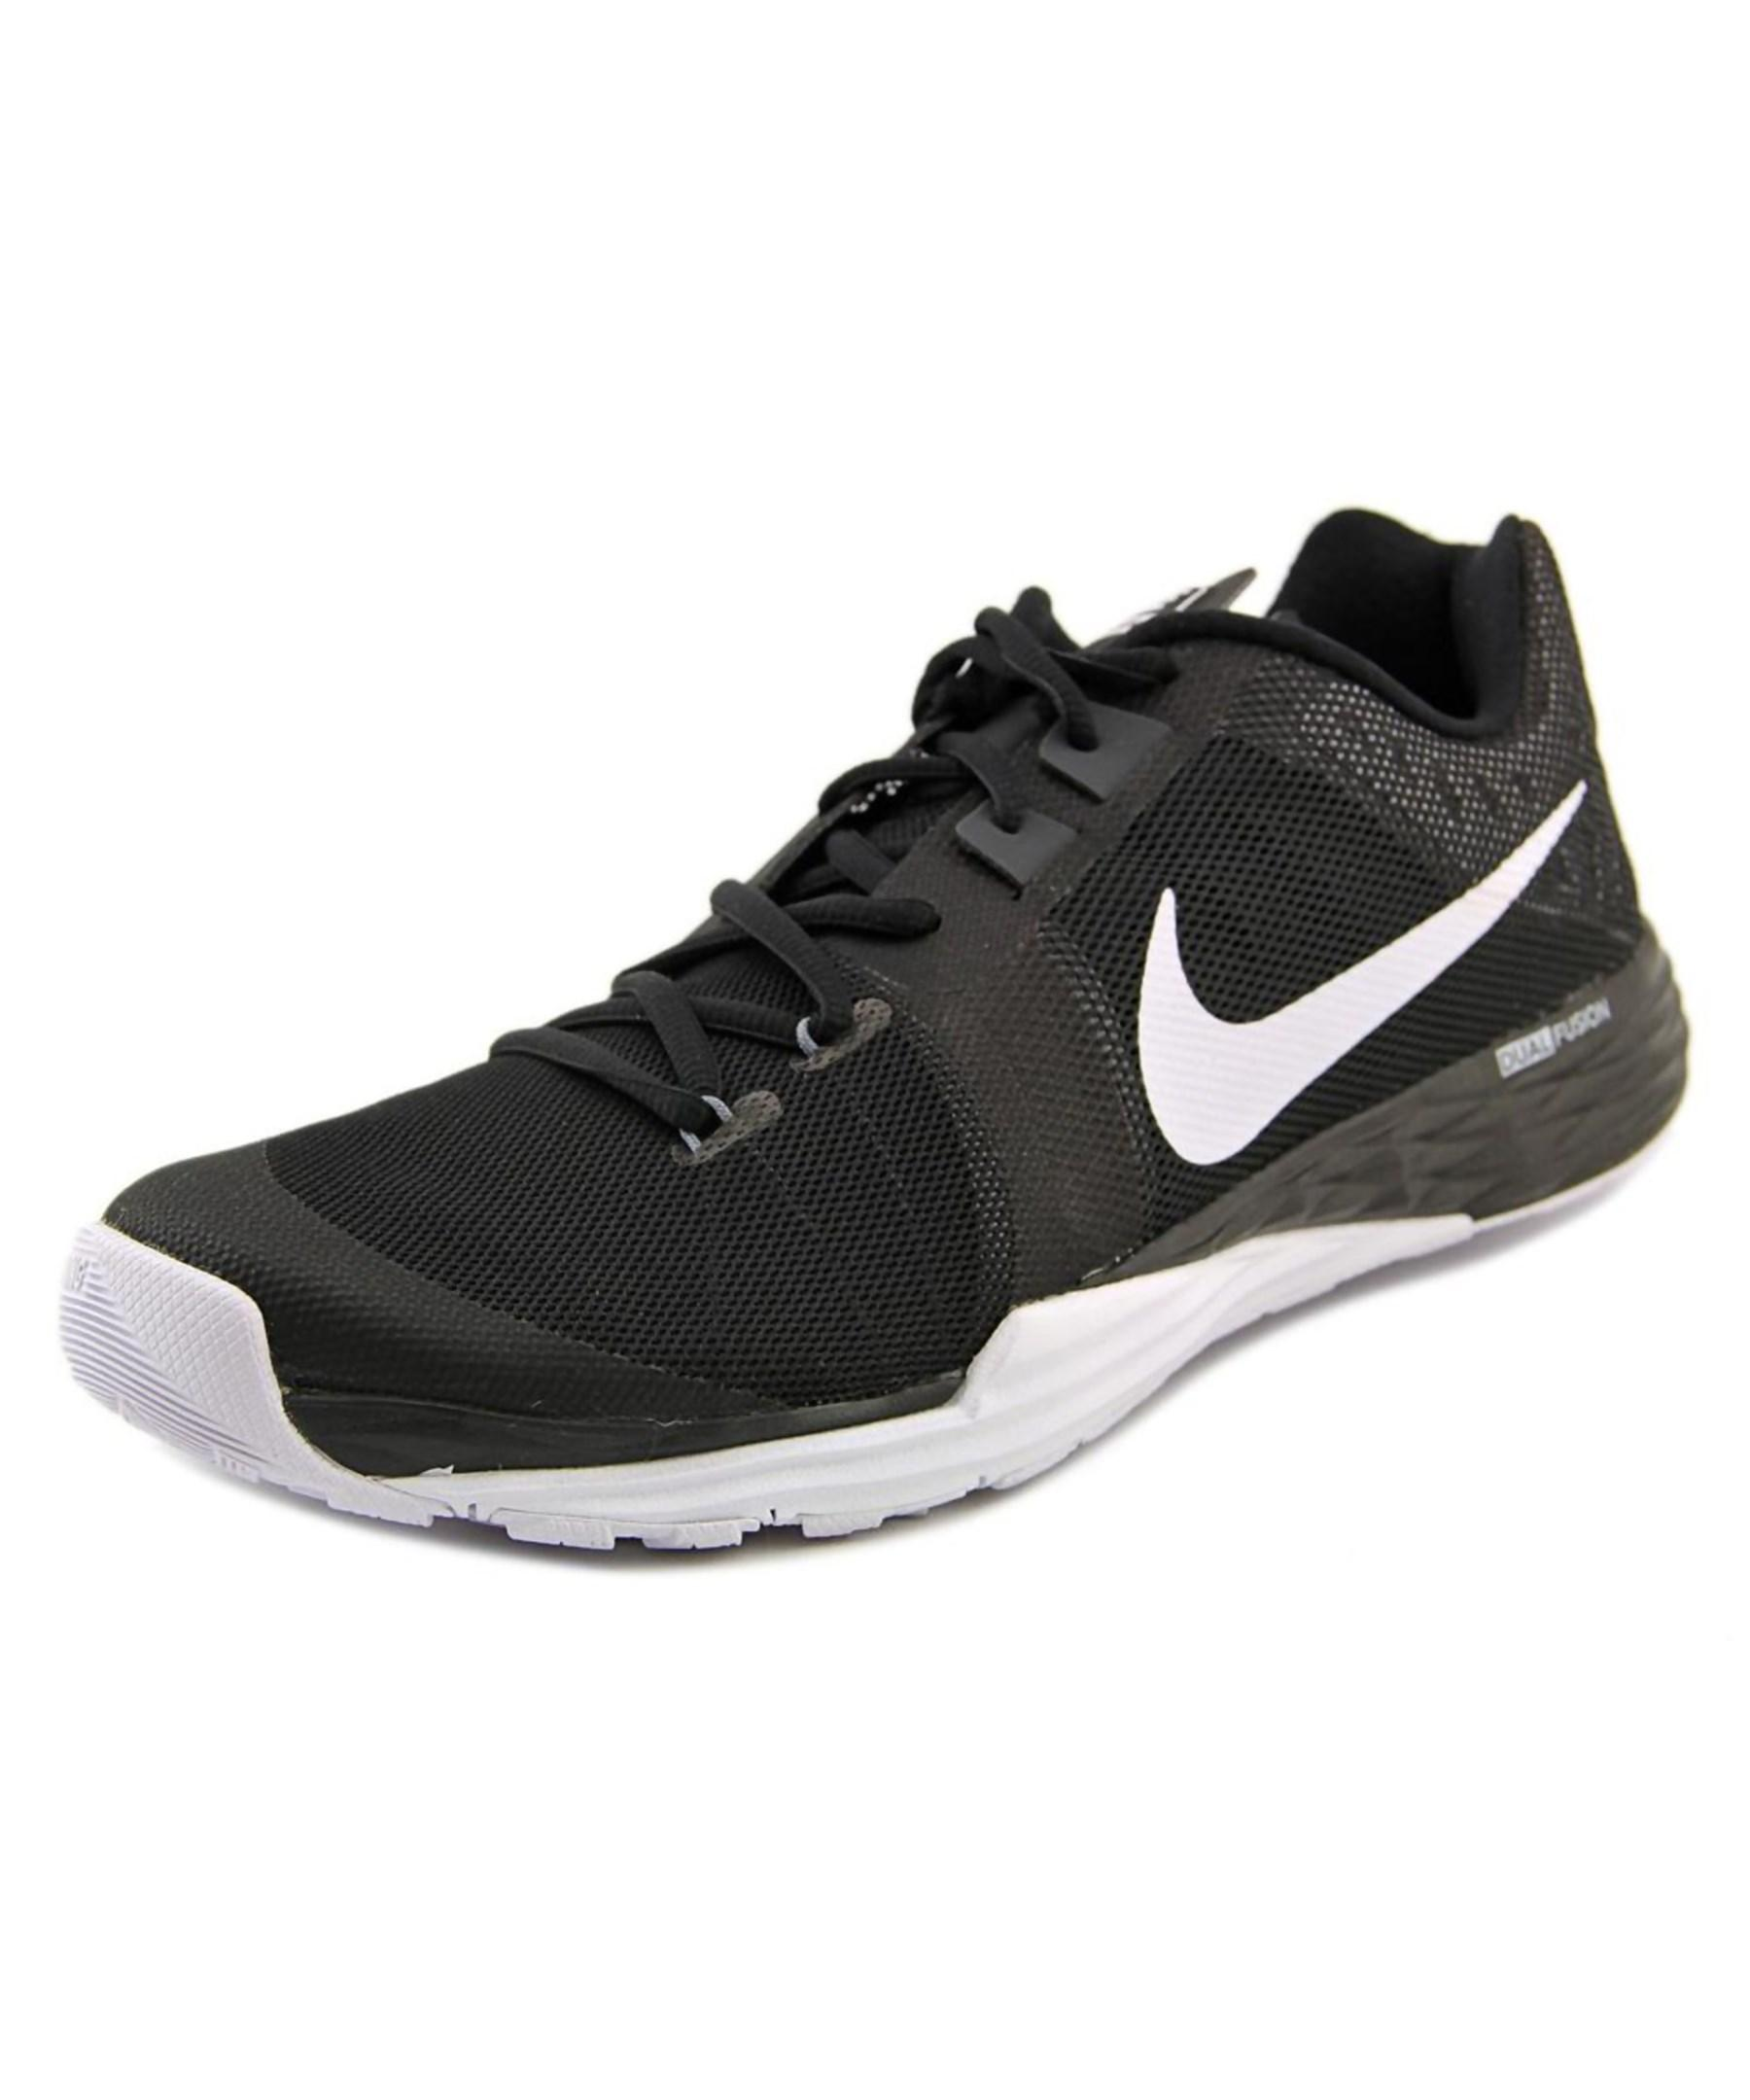 Nike Womens Cross Train Shoes